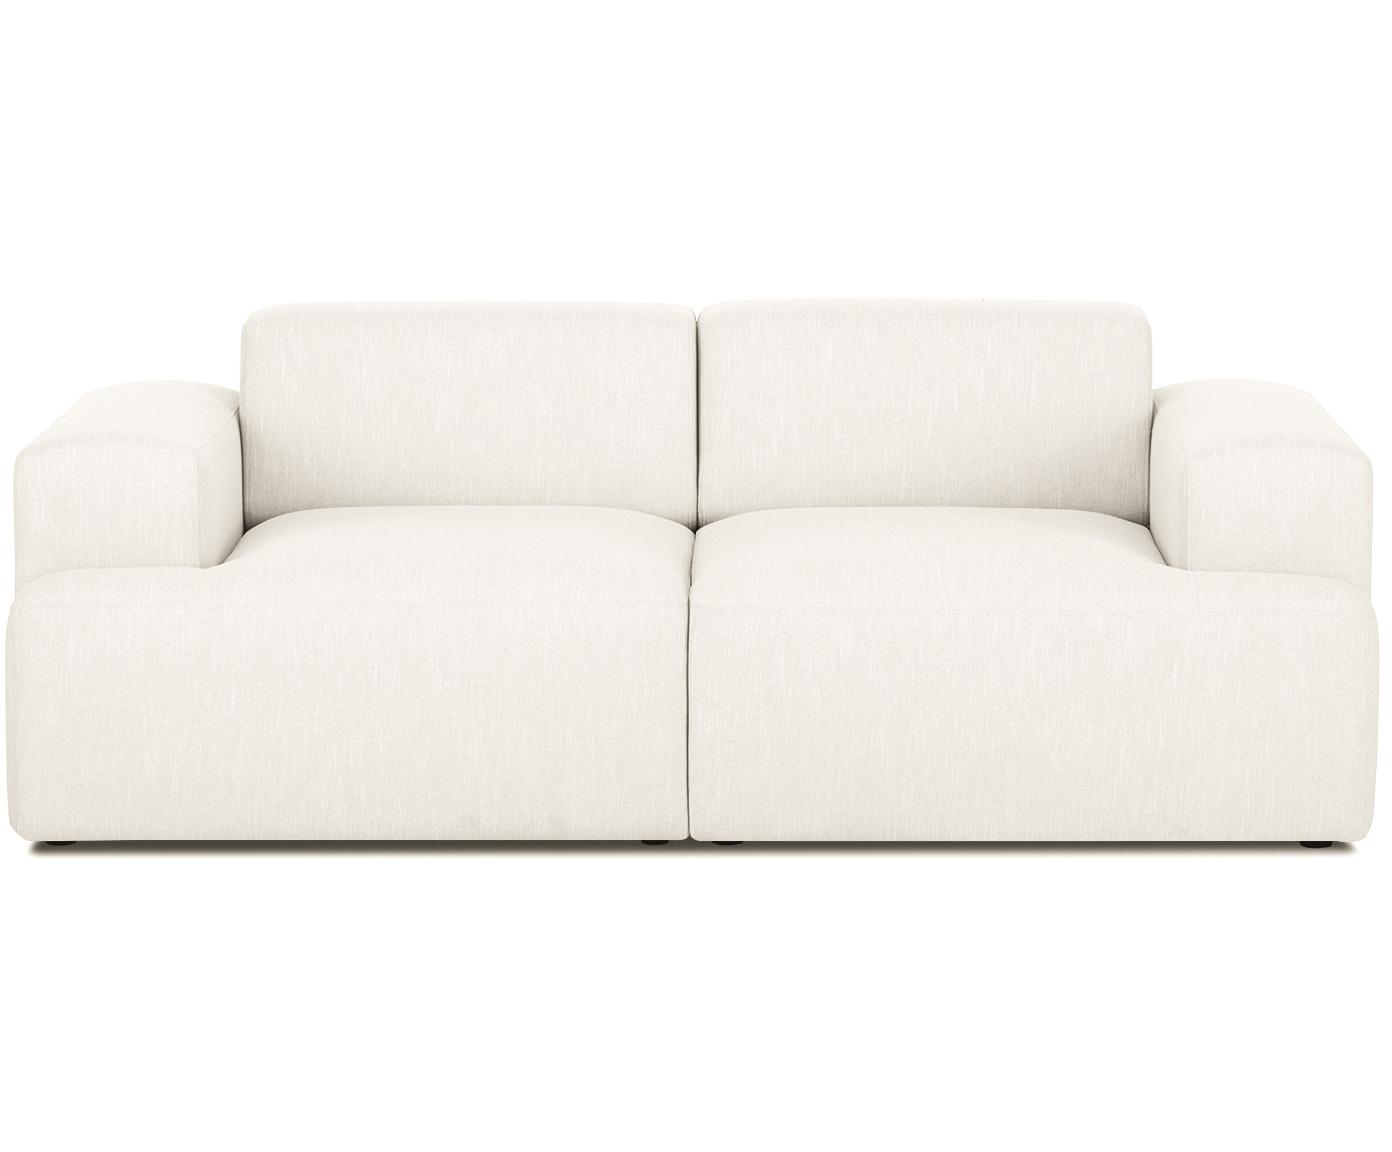 Bank Melva (2-zits), Bekleding: polyester, Frame: massief grenenhout, spaan, Poten: grenenhout, Geweven stof beige, B 200 x D 101 cm